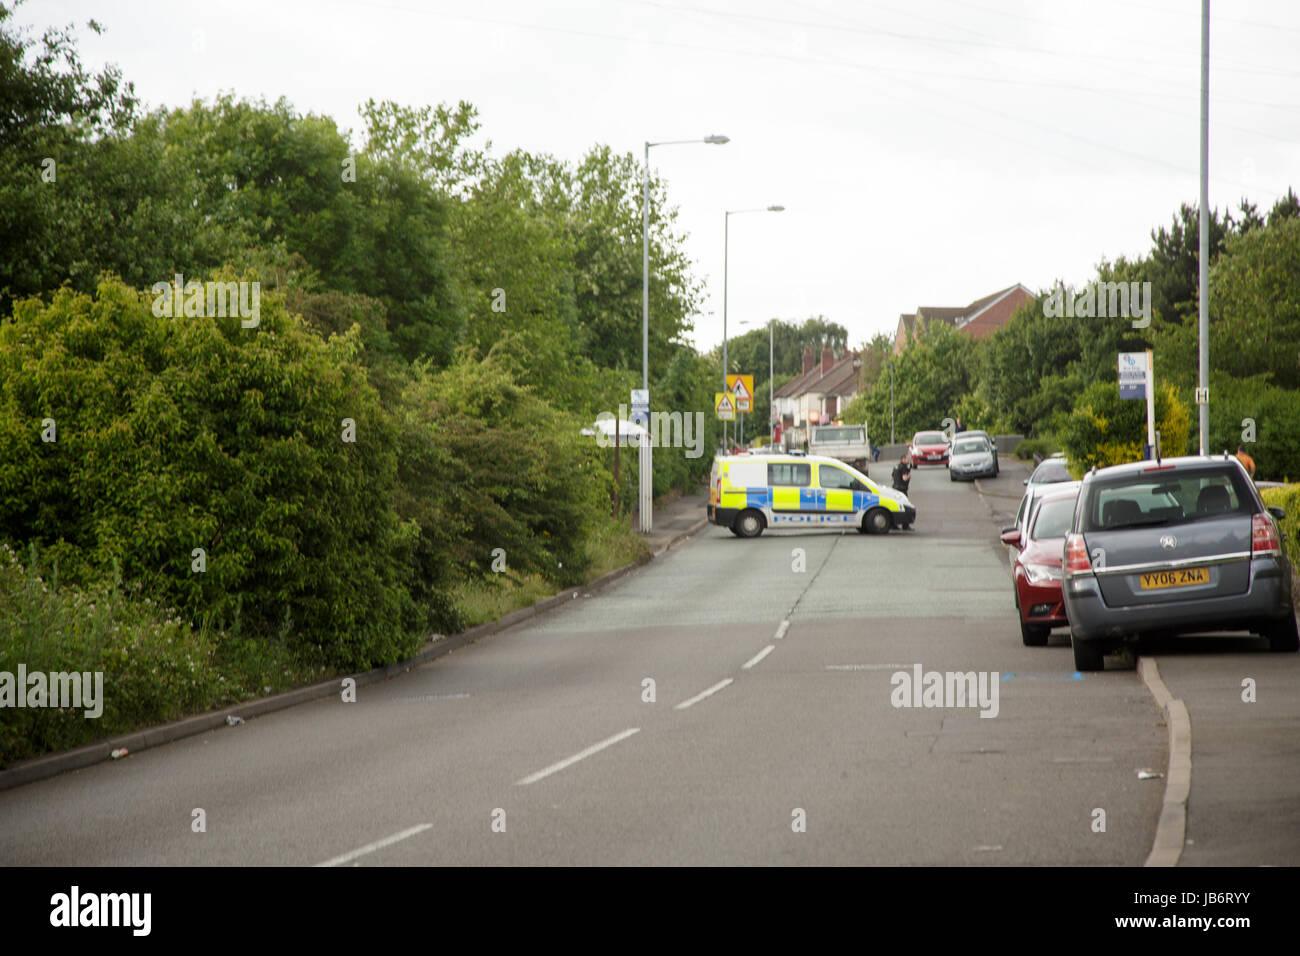 walsall, uk. 09th june, 2017. car crash leaves man seriously injured